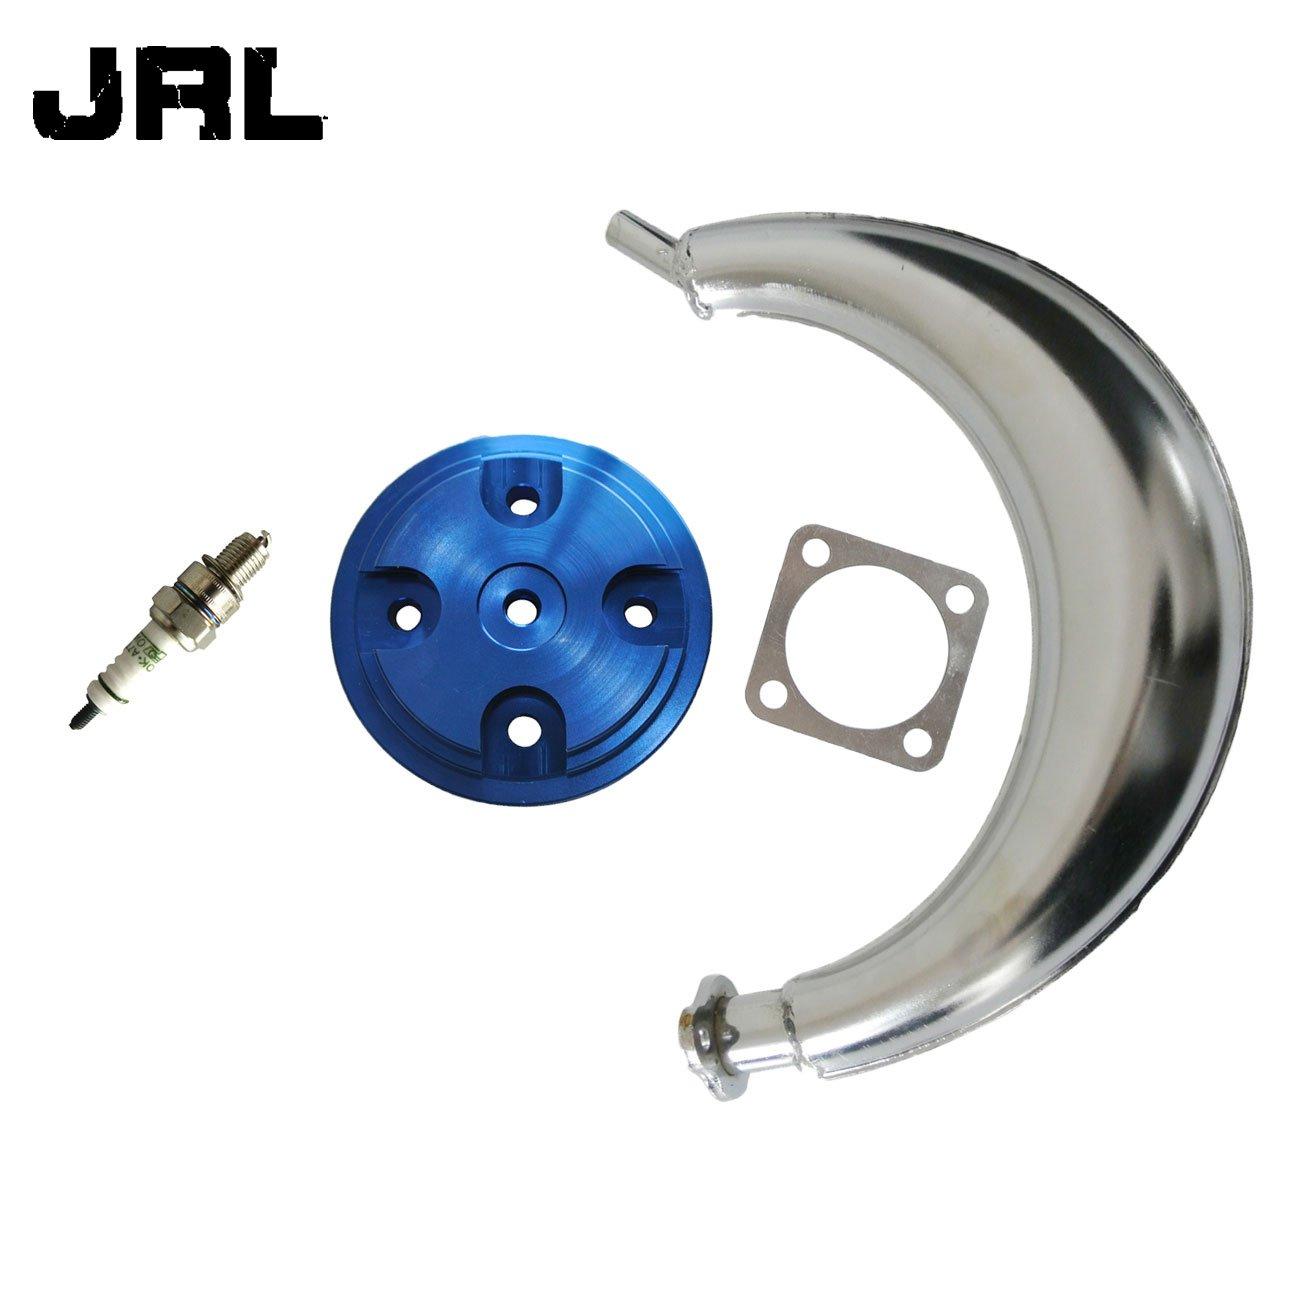 JRL CNC Blue Cylinder Head Cover&Muffler Exhaust For 66cc 80cc Motorized Bike Kang Di